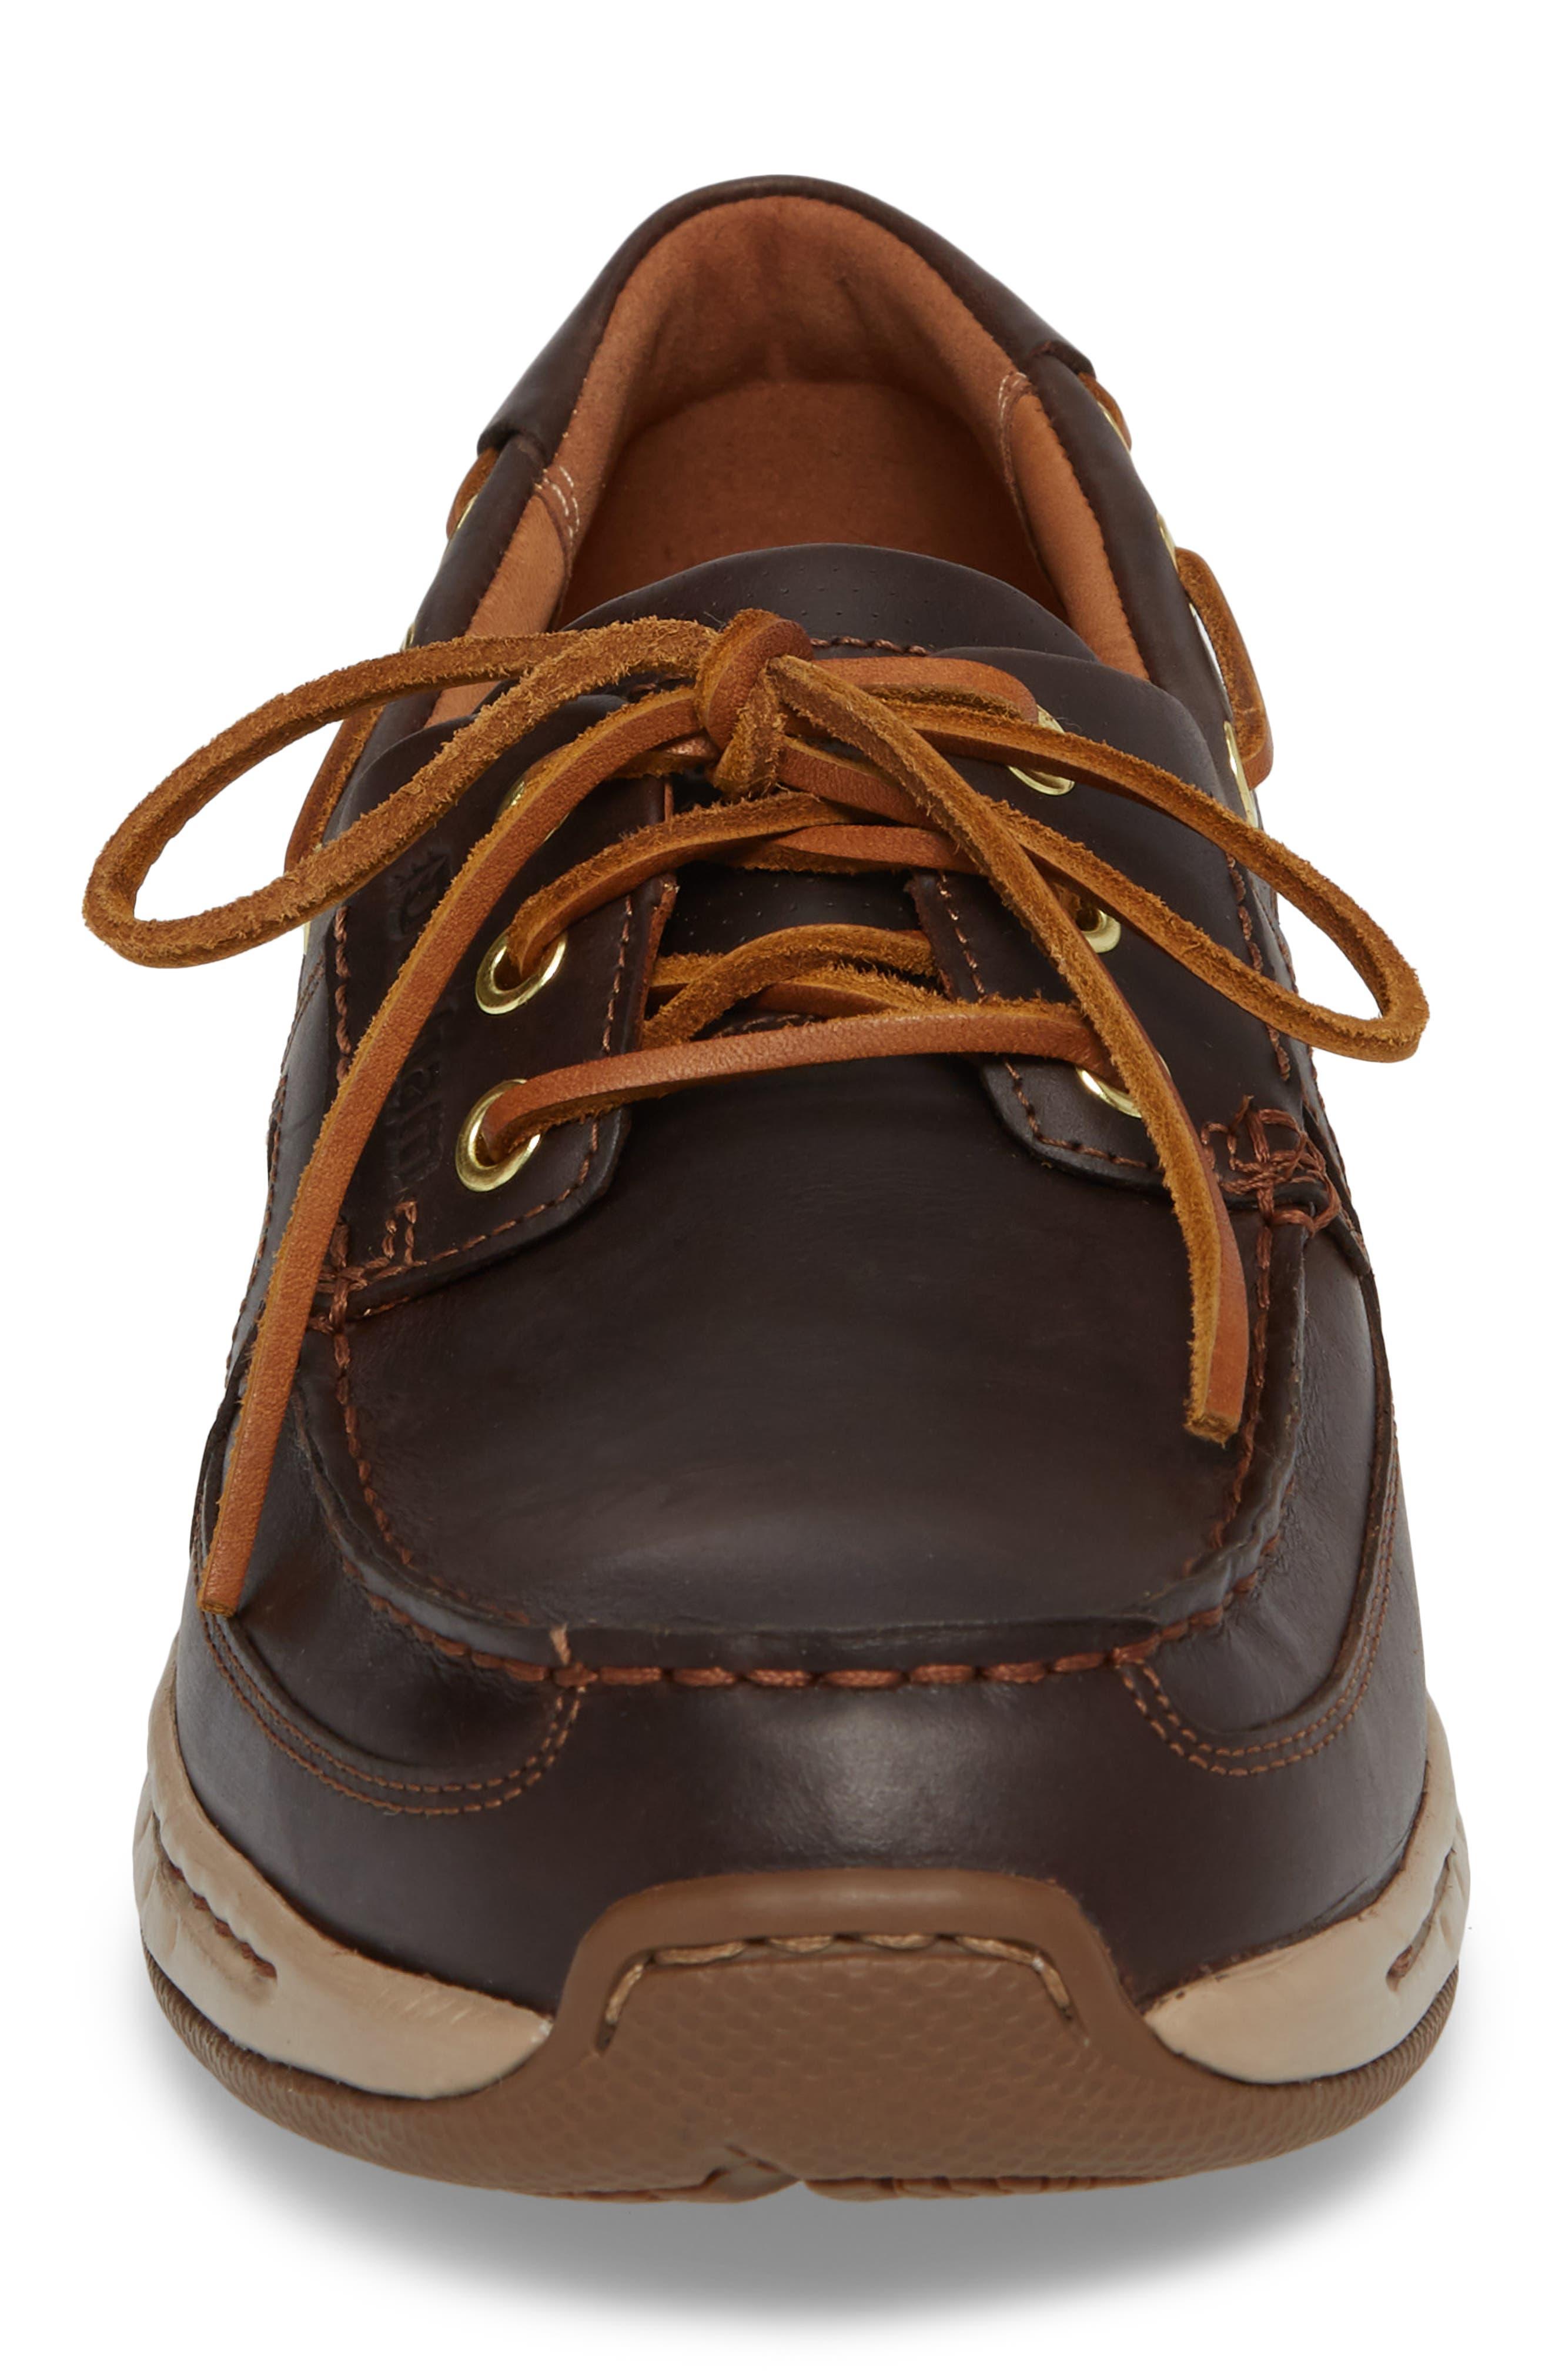 LTD Water Resistant Boat Shoe,                             Alternate thumbnail 4, color,                             Tan Leather